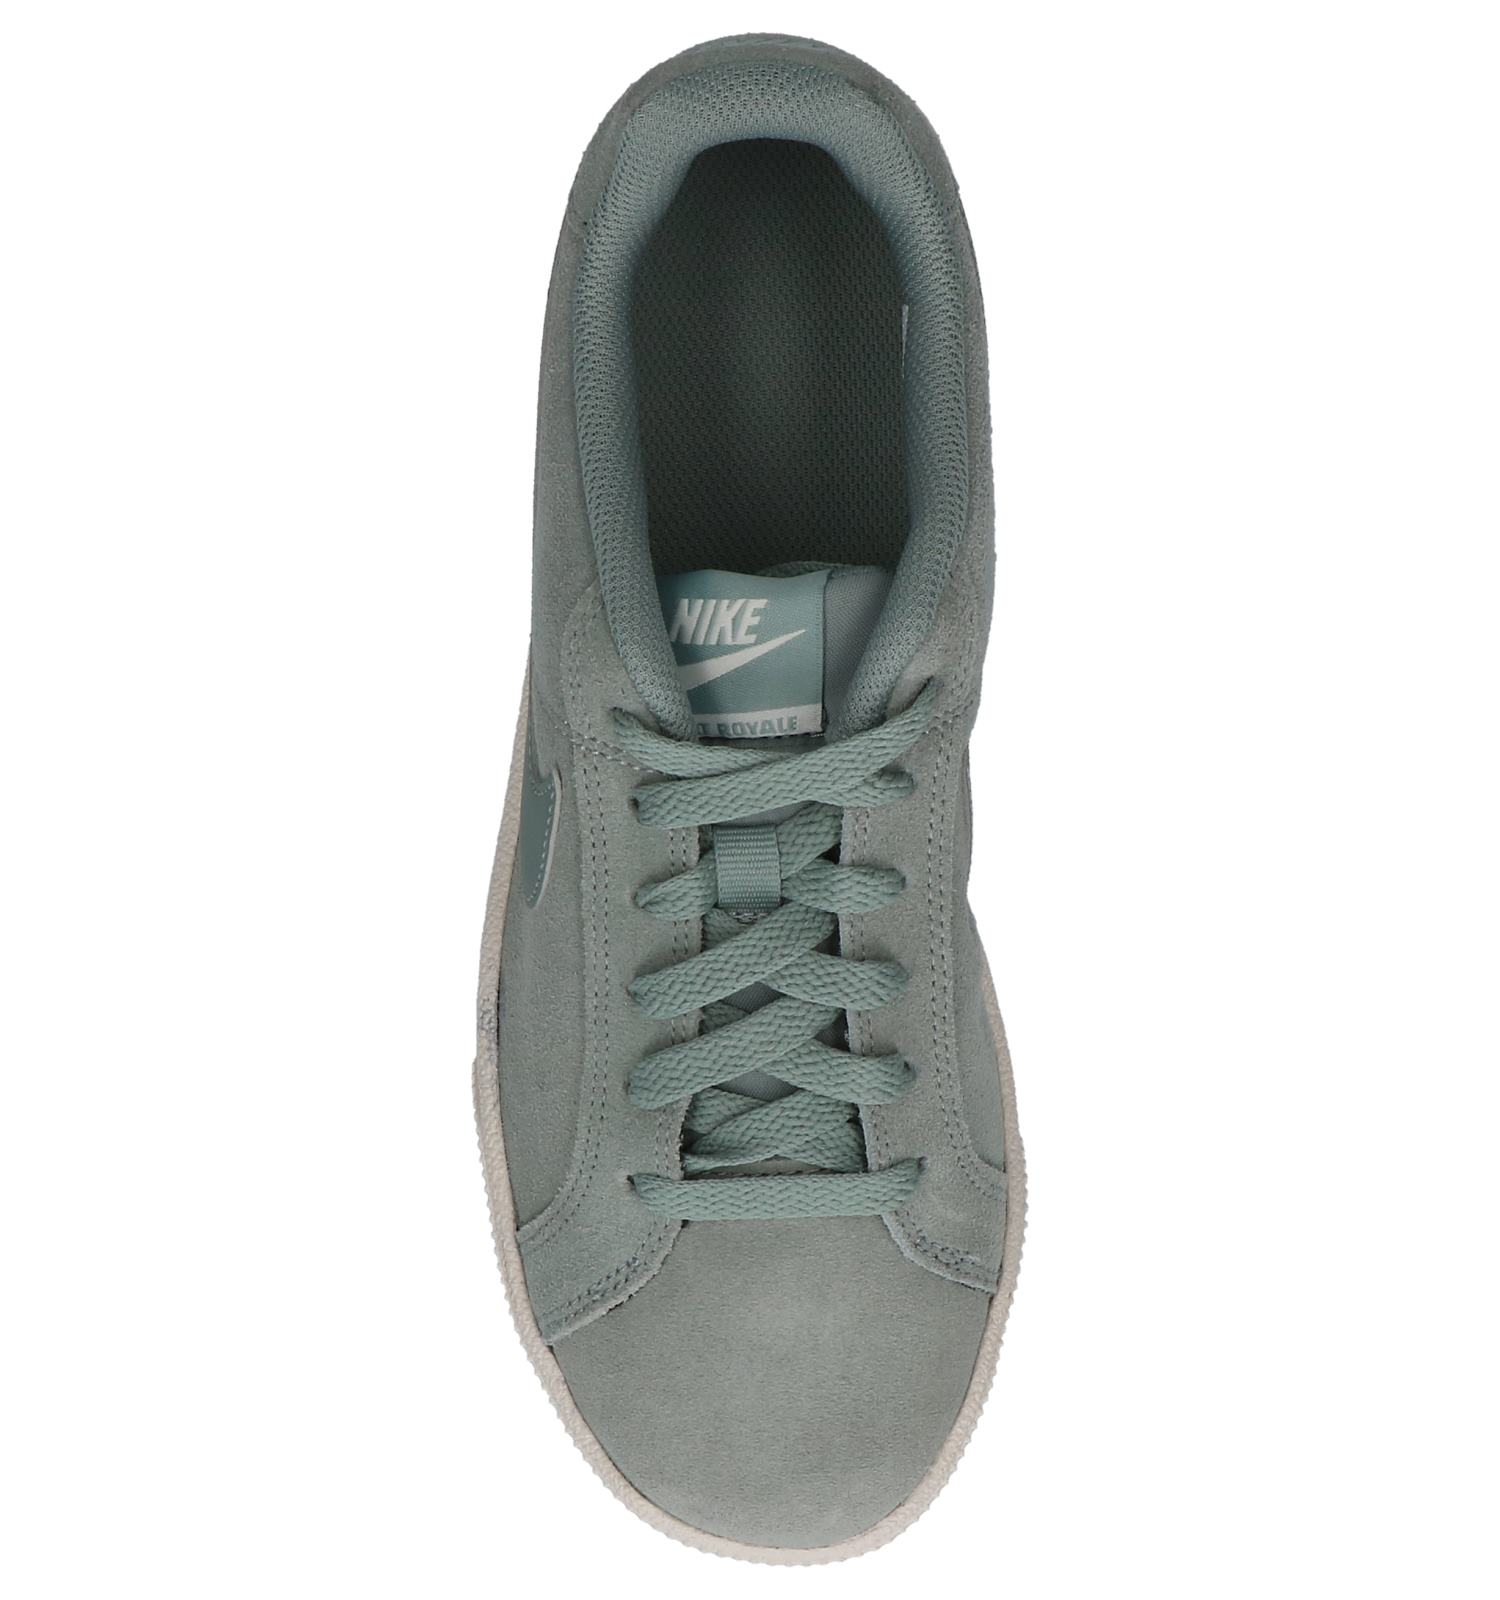 new concept 89dbd 7dbfd Nike Court Royale Munt Groene Sneakers  TORFS.BE  Gratis verzend en retour